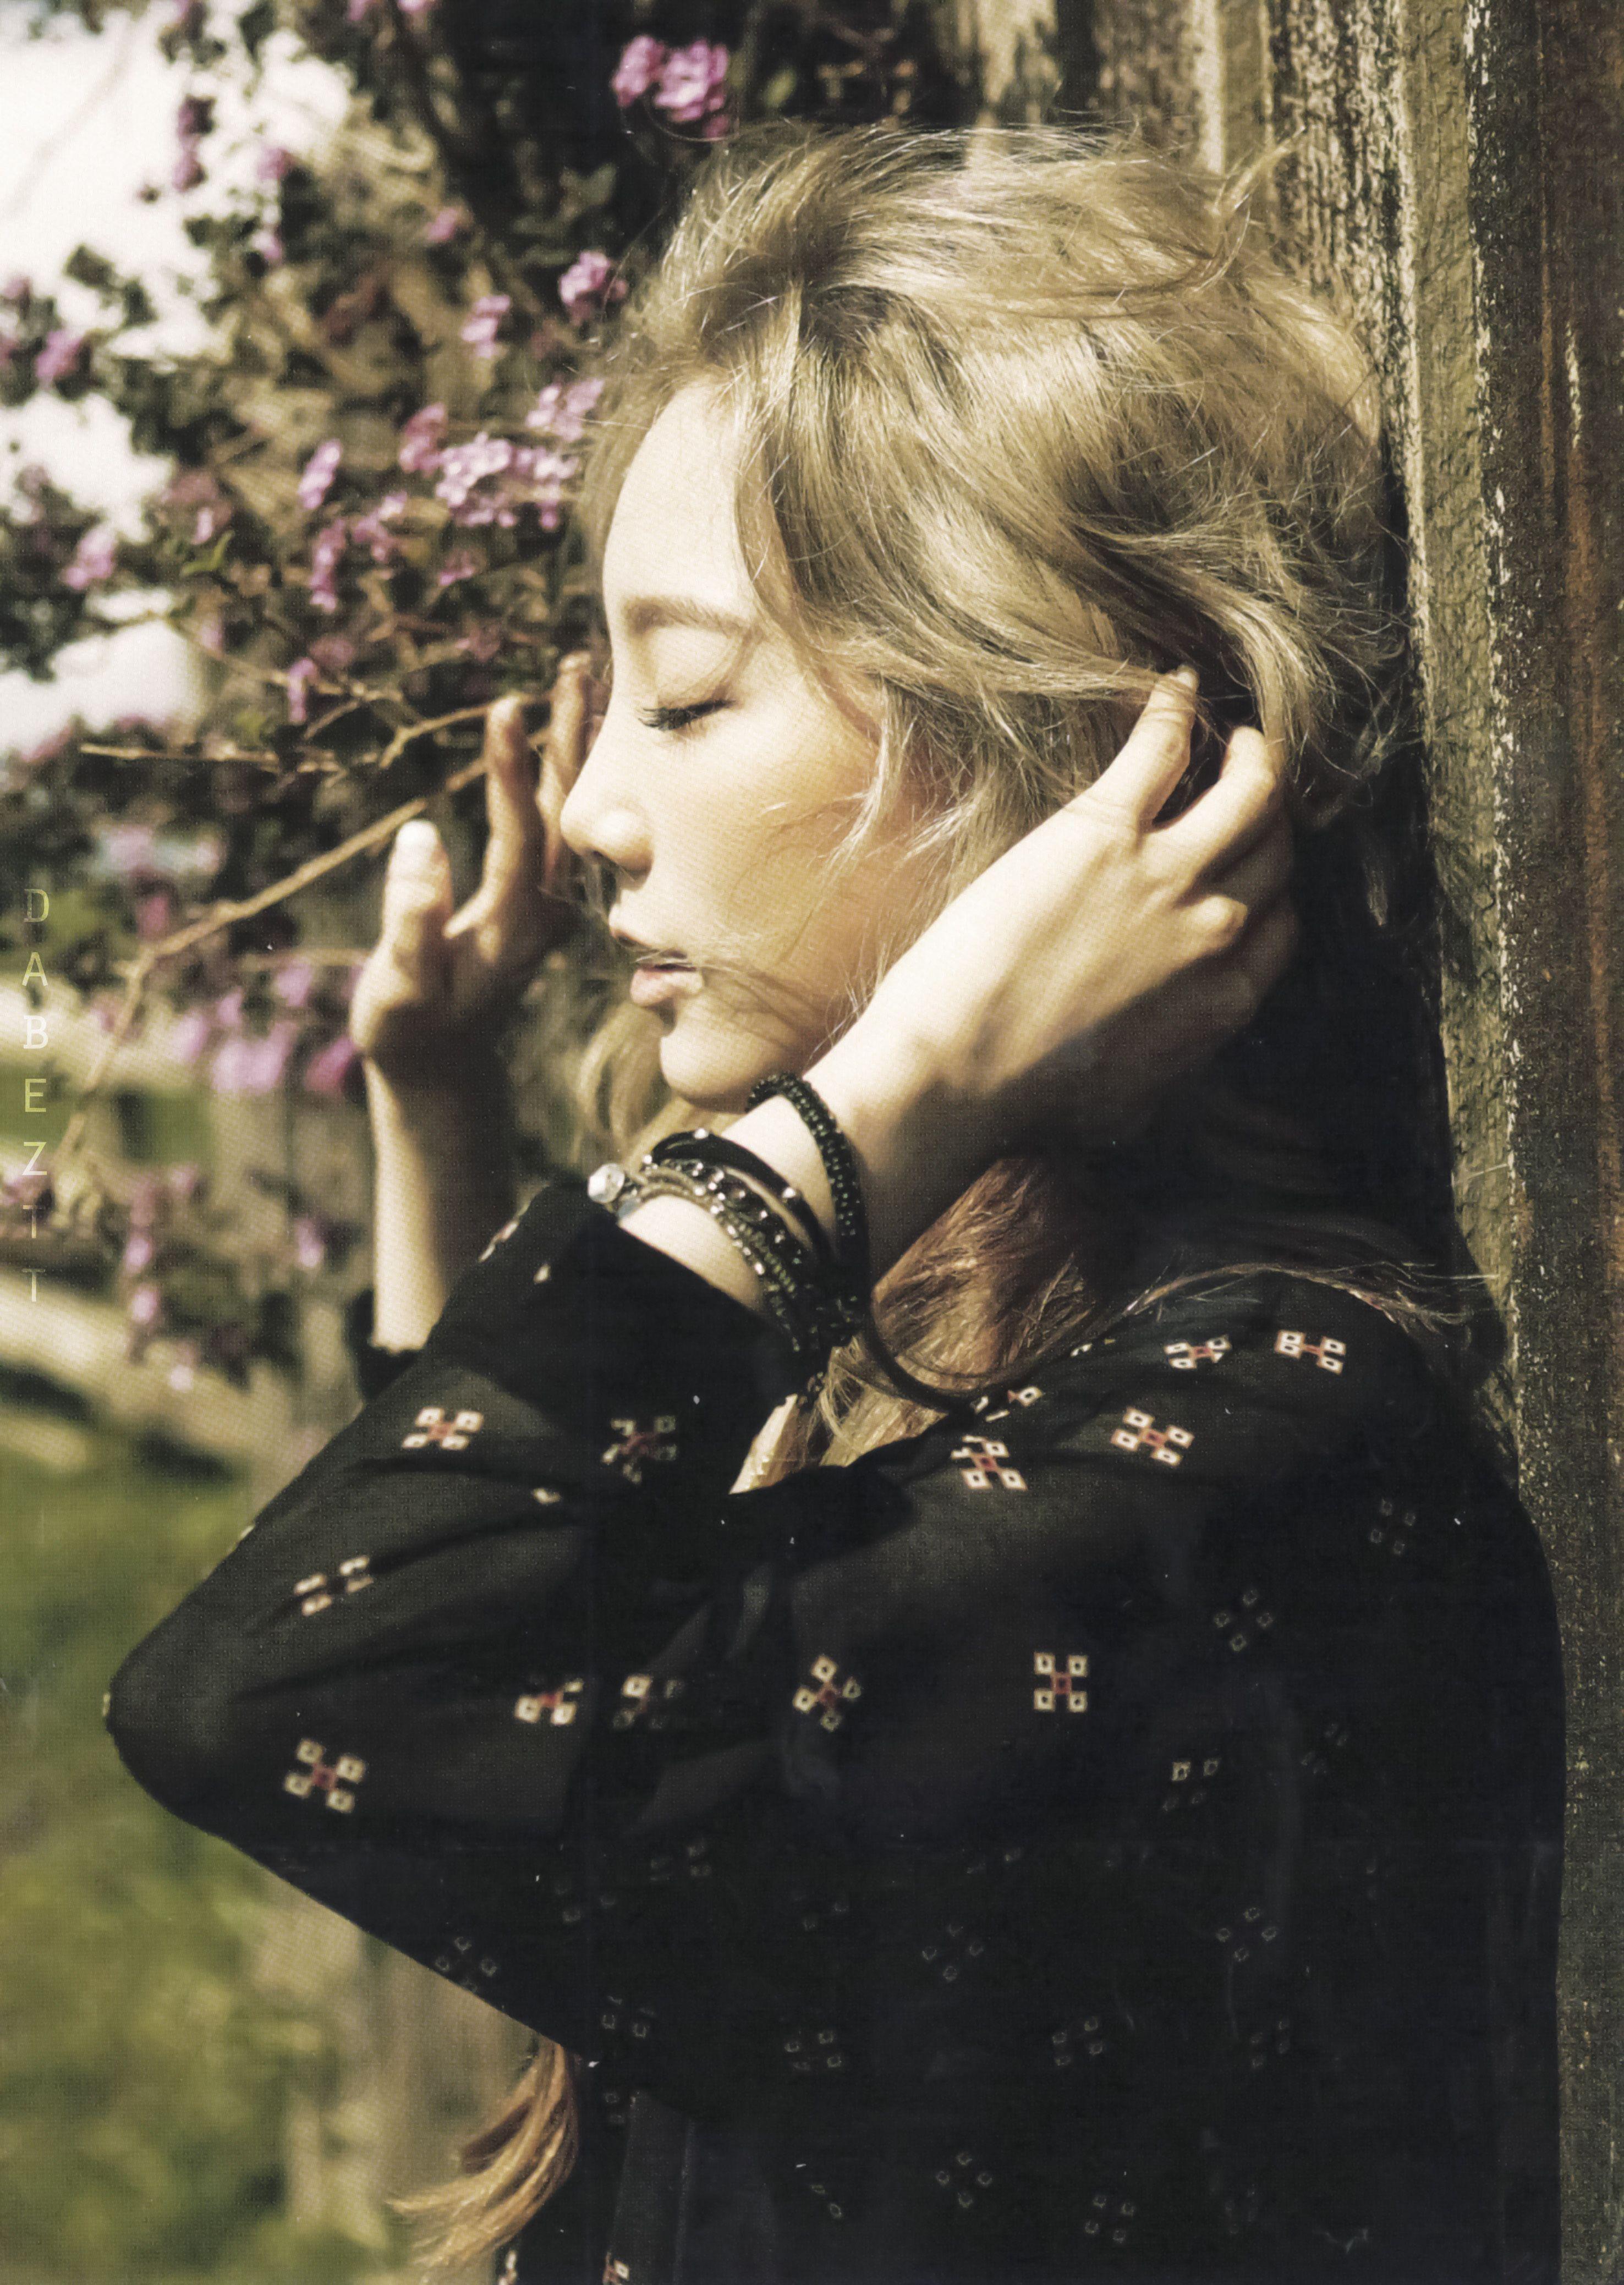 Bfog 태연 Taengu OST